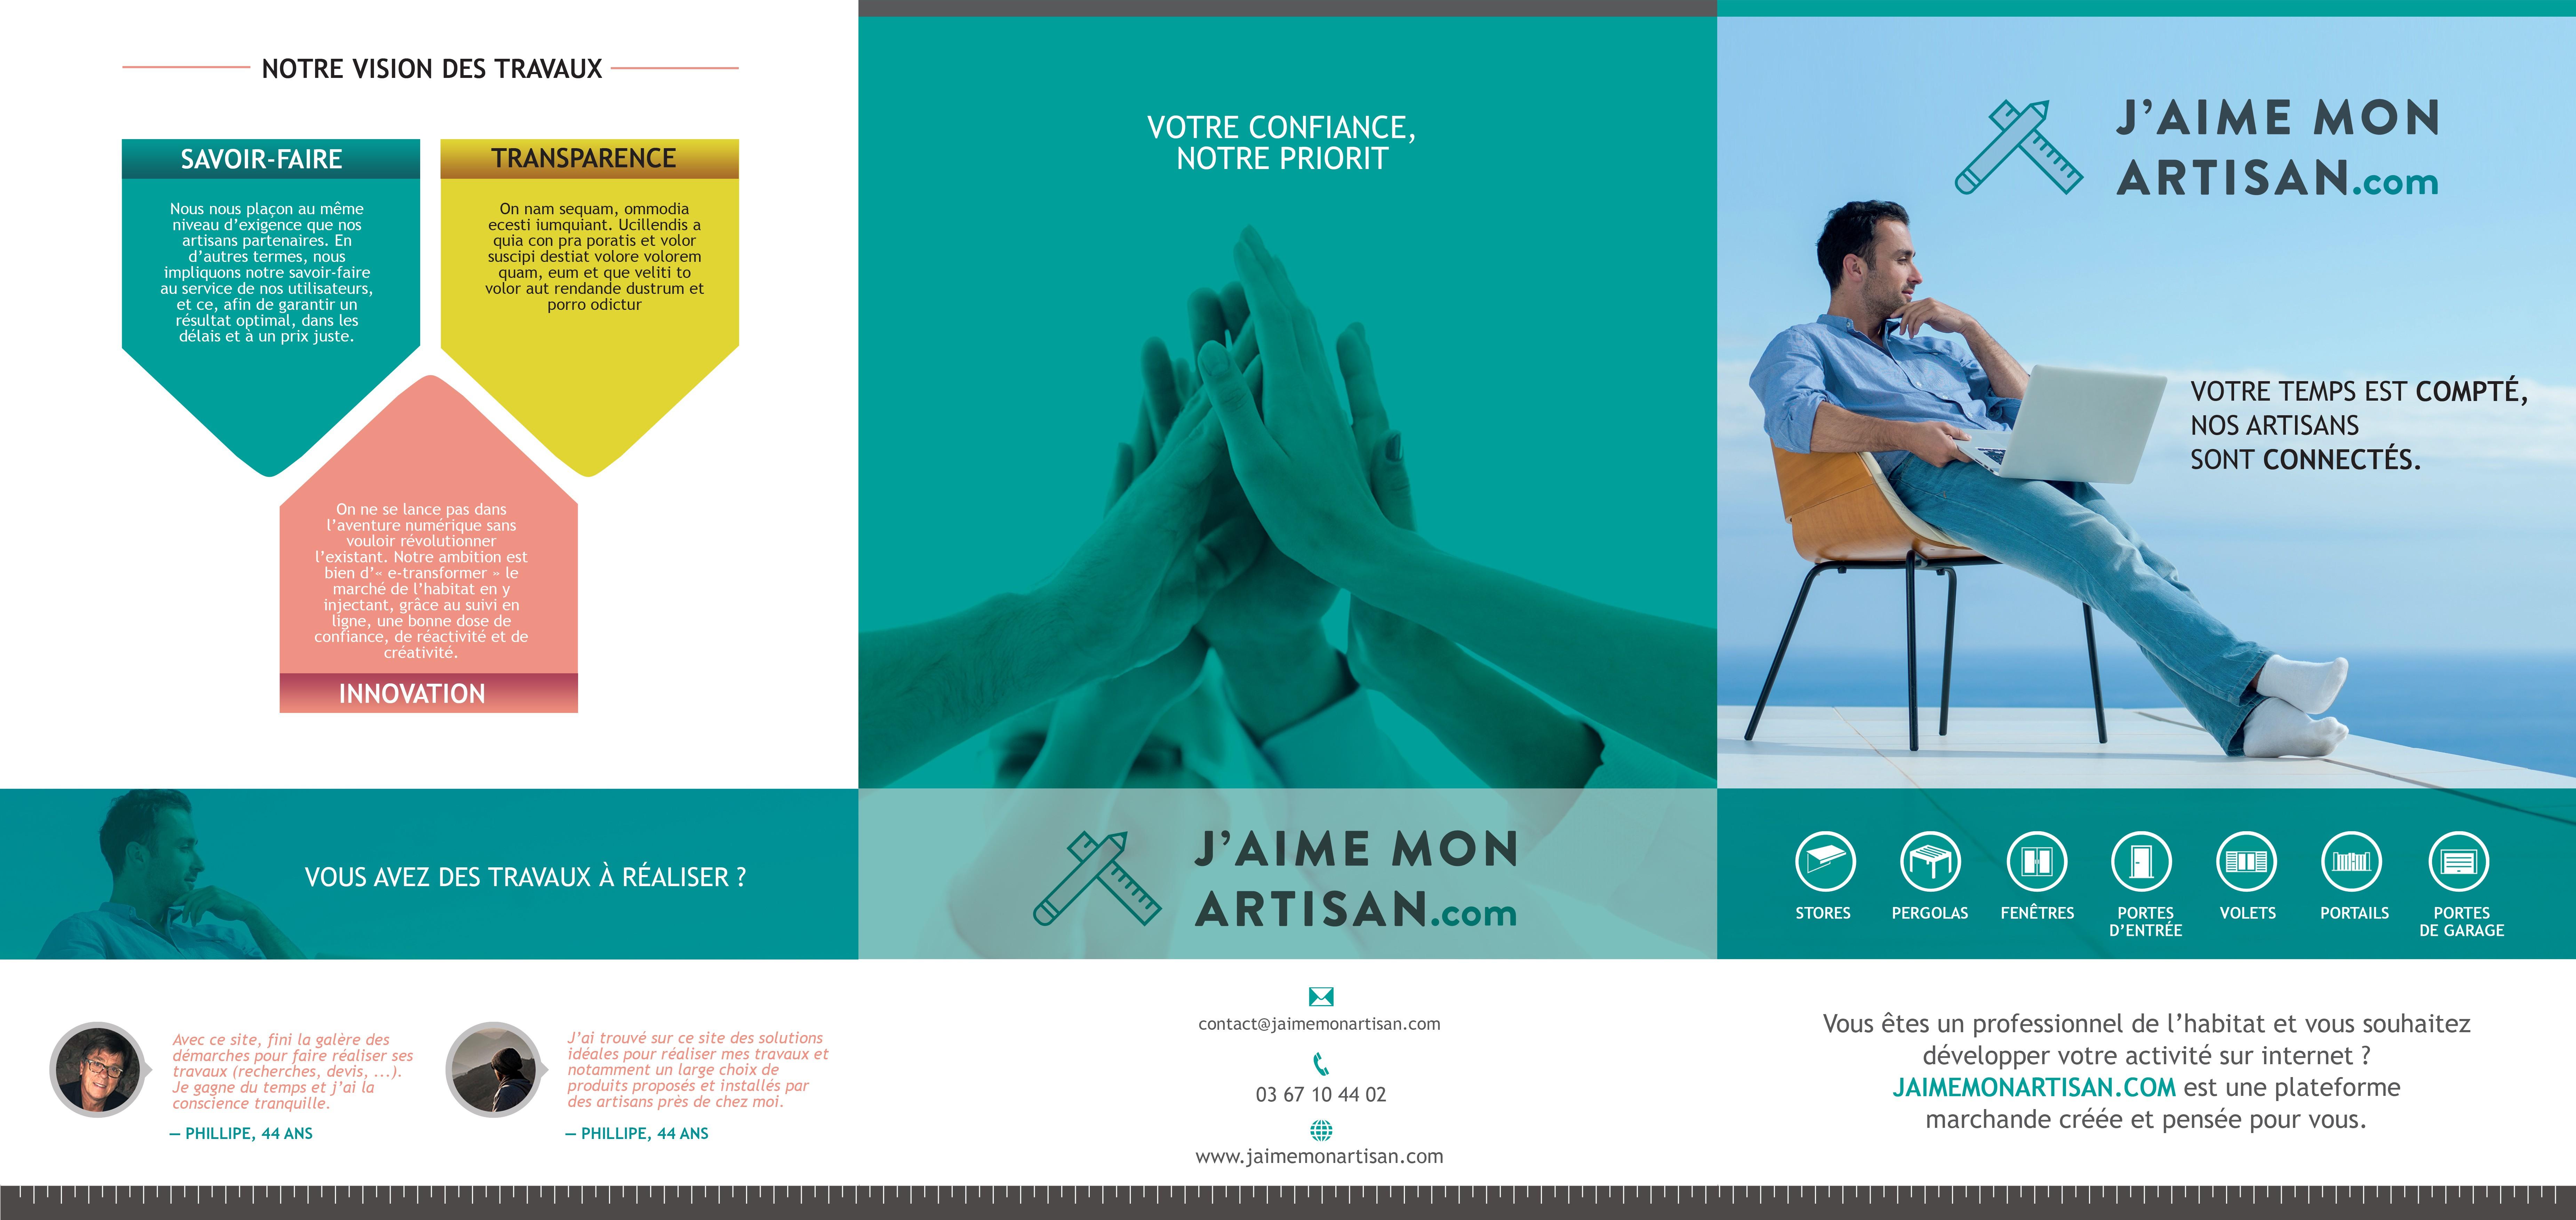 Your creativity for Our commercial brochure | JaimeMonArtisan.com